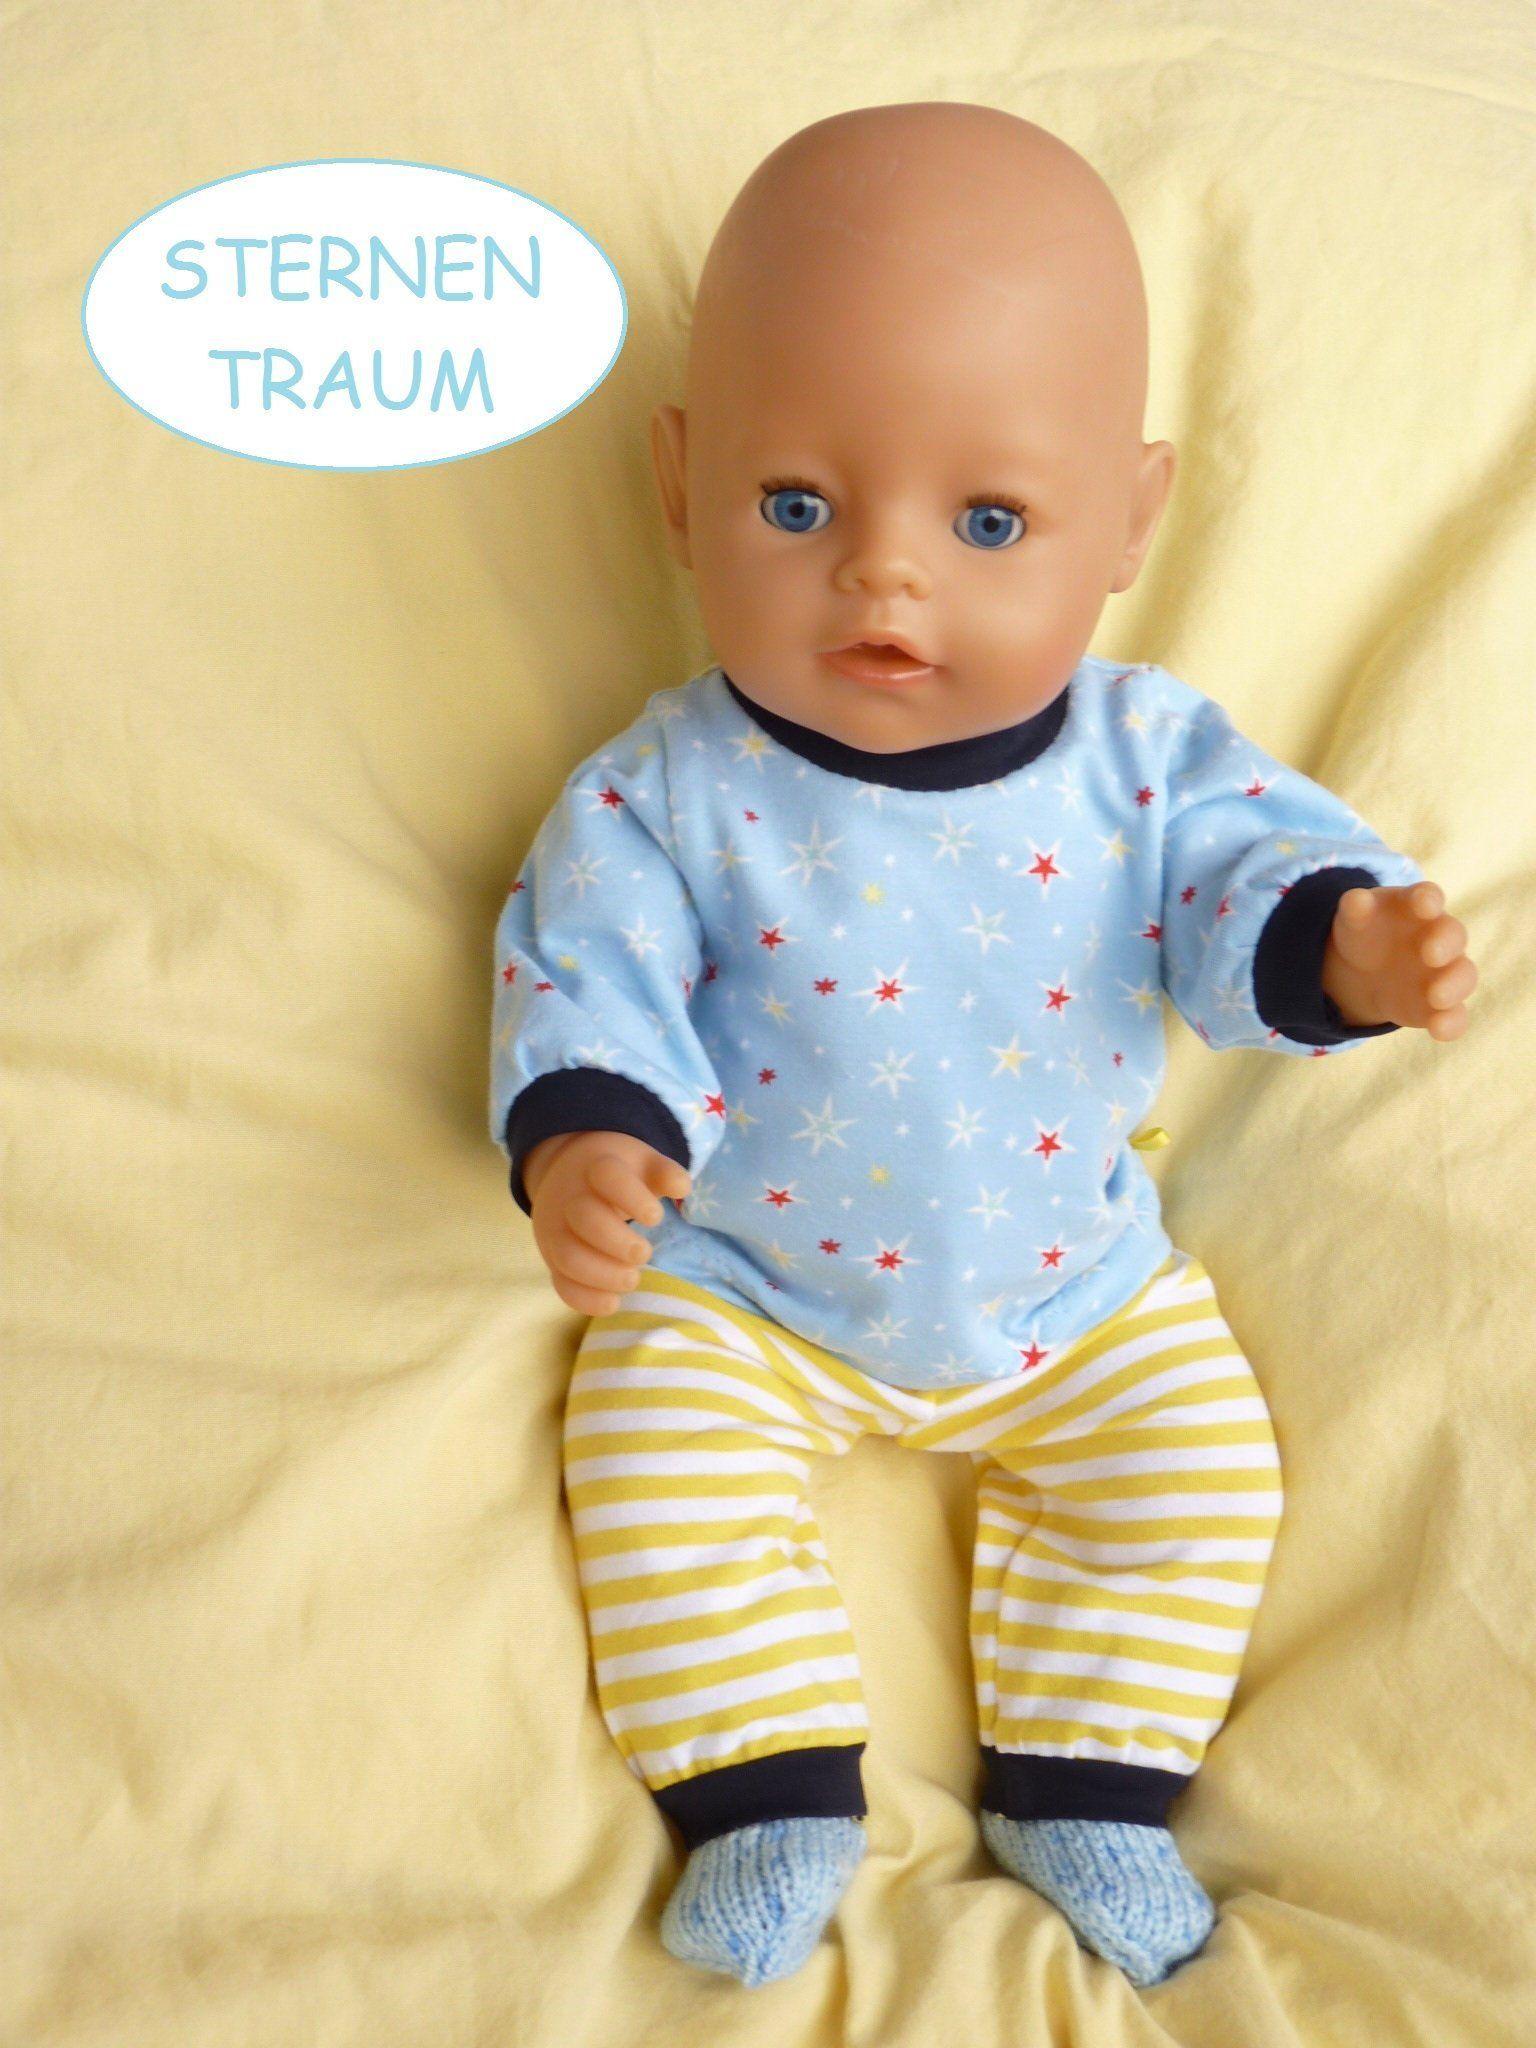 30783c519d4cf Doll clothes Gr.40-45 cm 3tlg set e.g. for Babyborn Sister 43 cm boy ...